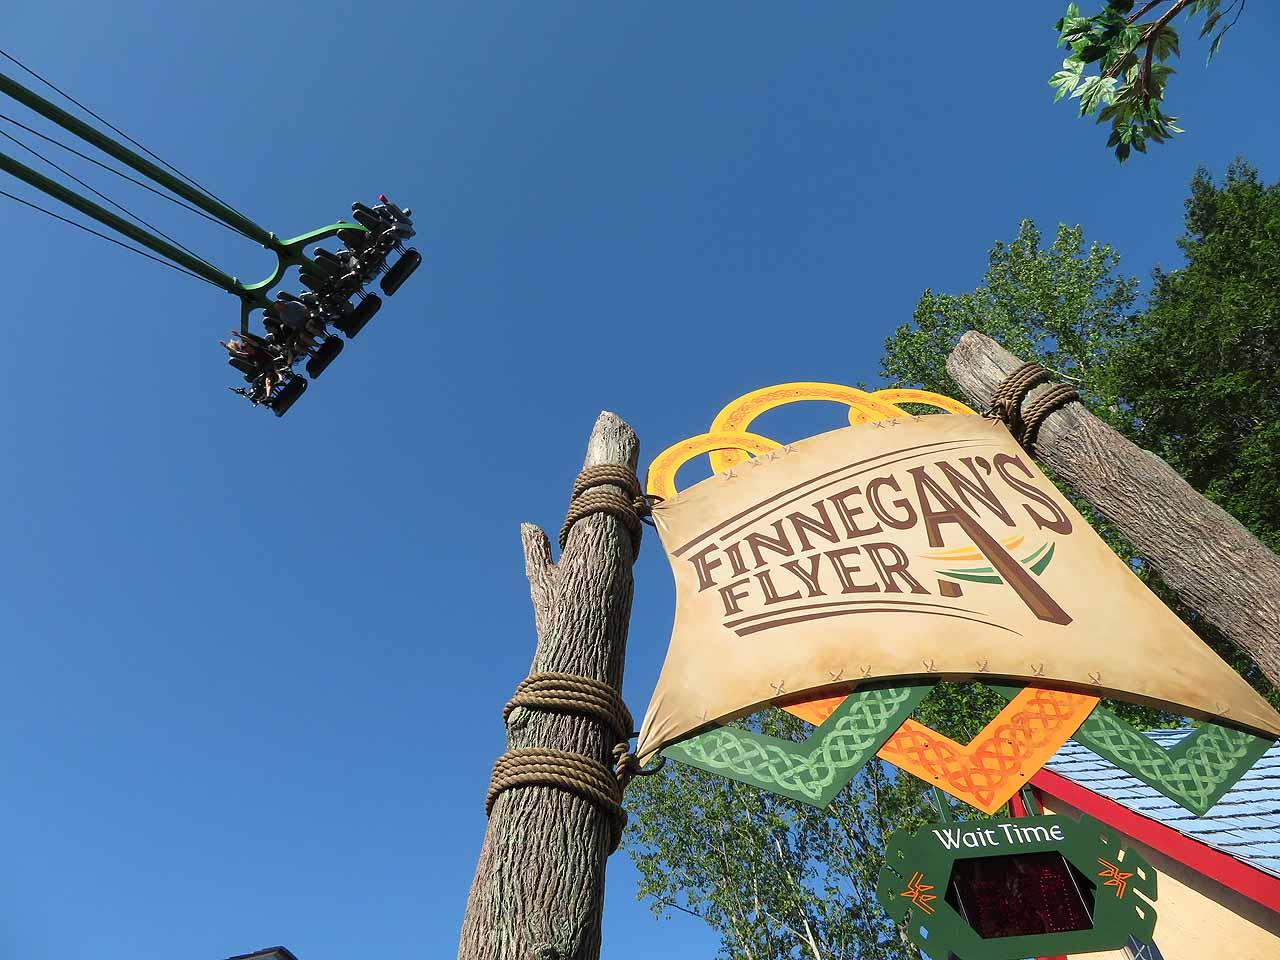 Finnegan S Flyer Takes Flight At Busch Gardens Williamsburg Coaster101